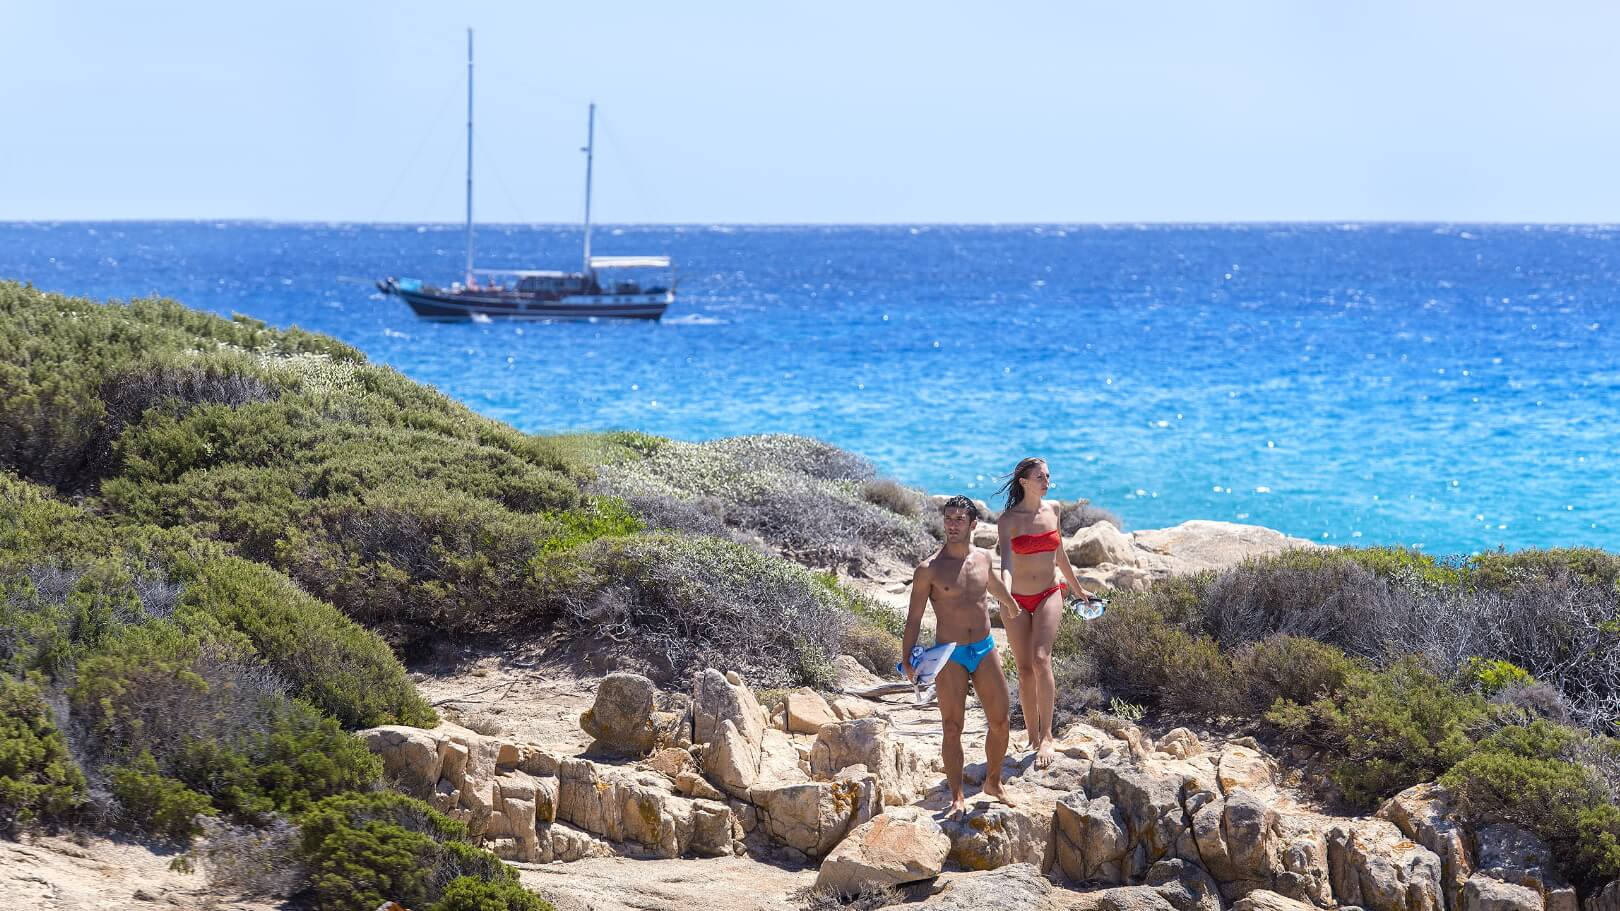 https://www.chialagunaresort.com/wp-content/uploads/2021/05/IHC_Chia-Laguna-Resort_grid_romantic_couple-snorkeling-sea.jpg